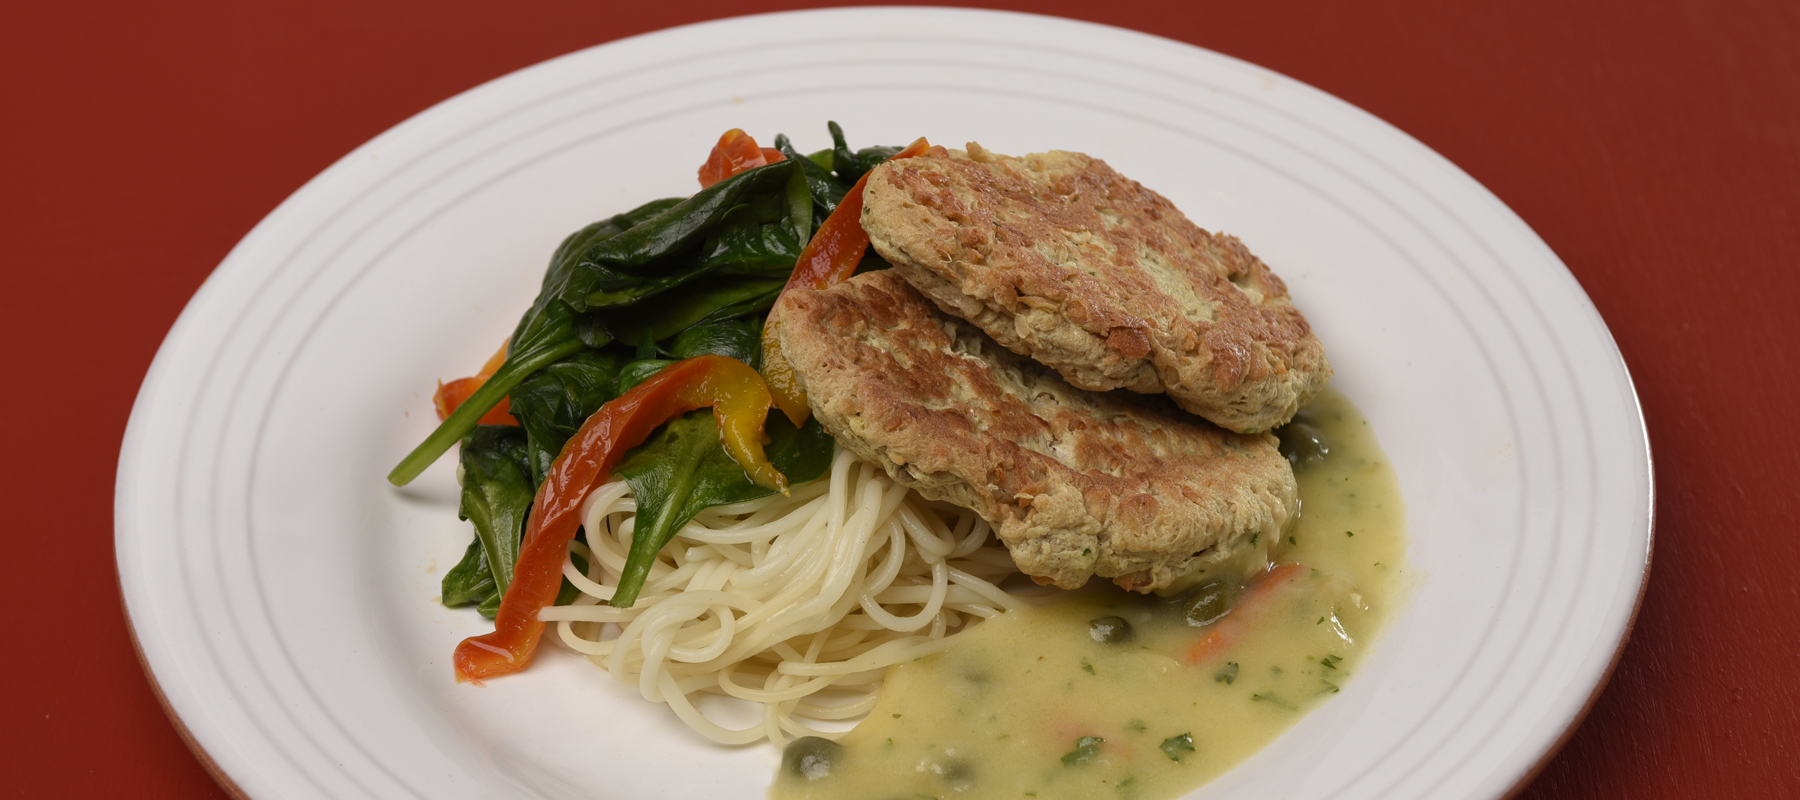 Vejje-meatless-chicken-piccata